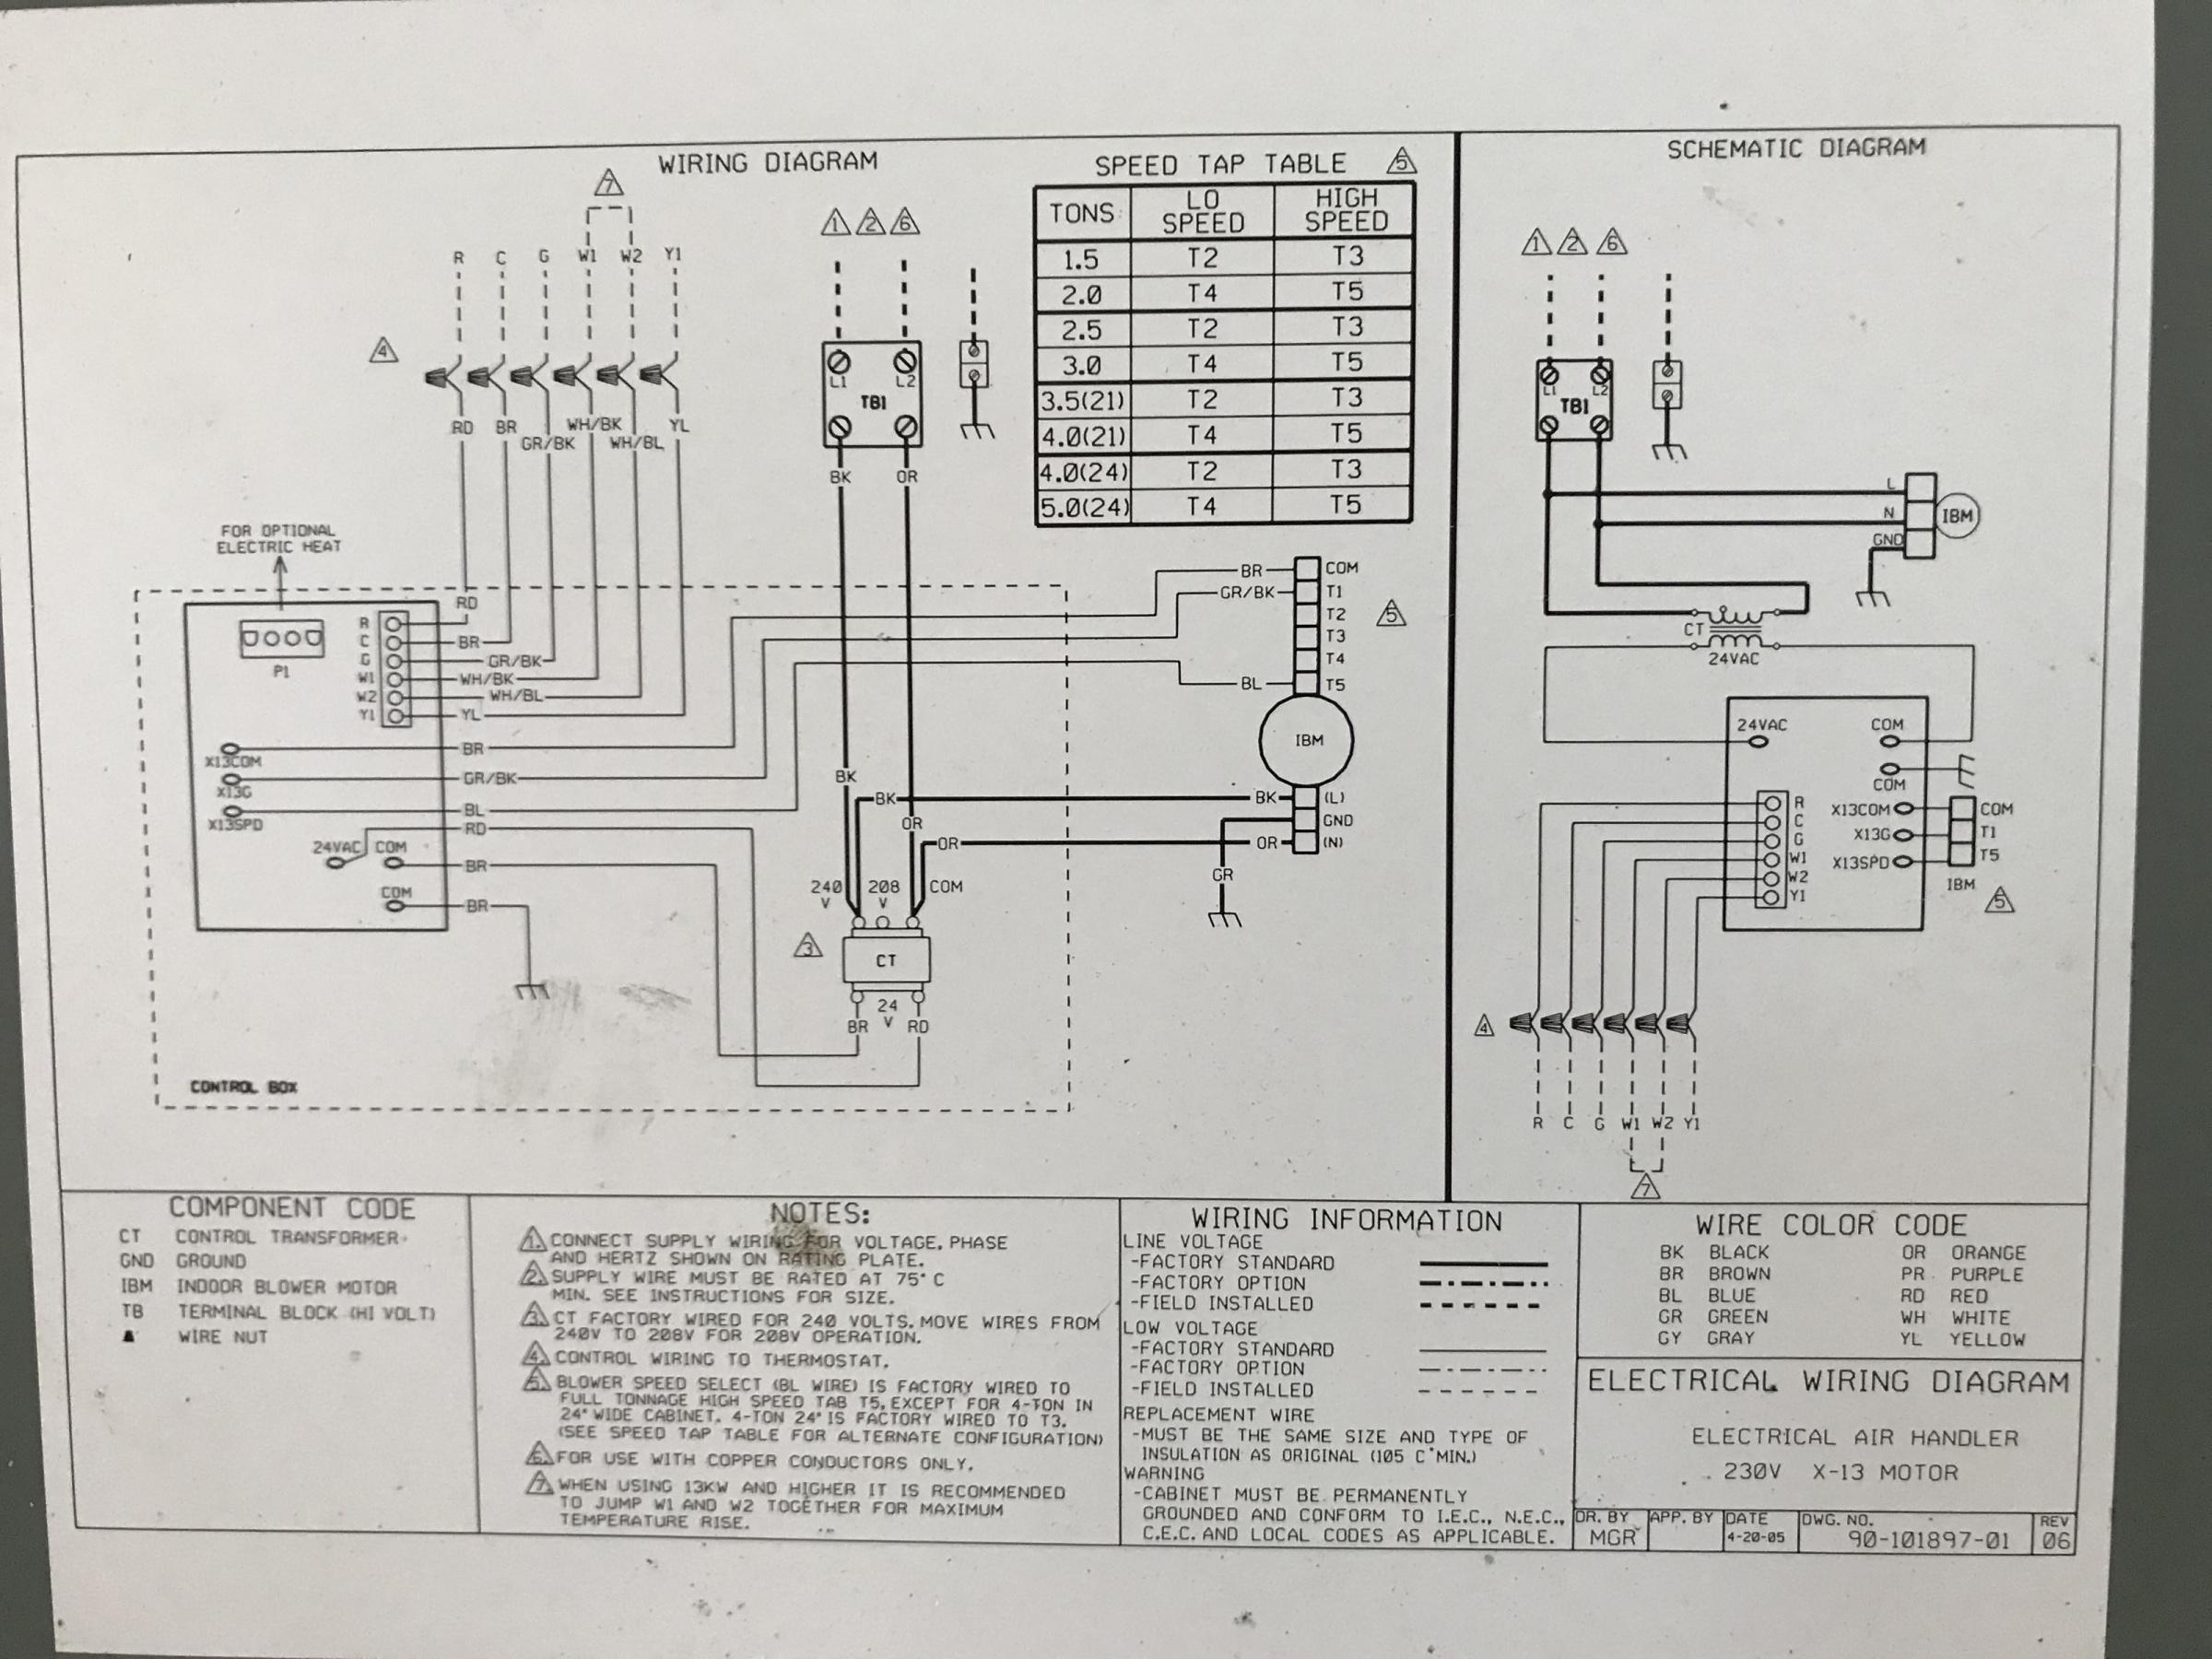 X13 ECM Blower Motor Replacement?-fb89563f-9c2a-440b-9cd7-77f4472d3bcc_1592135088722.jpg